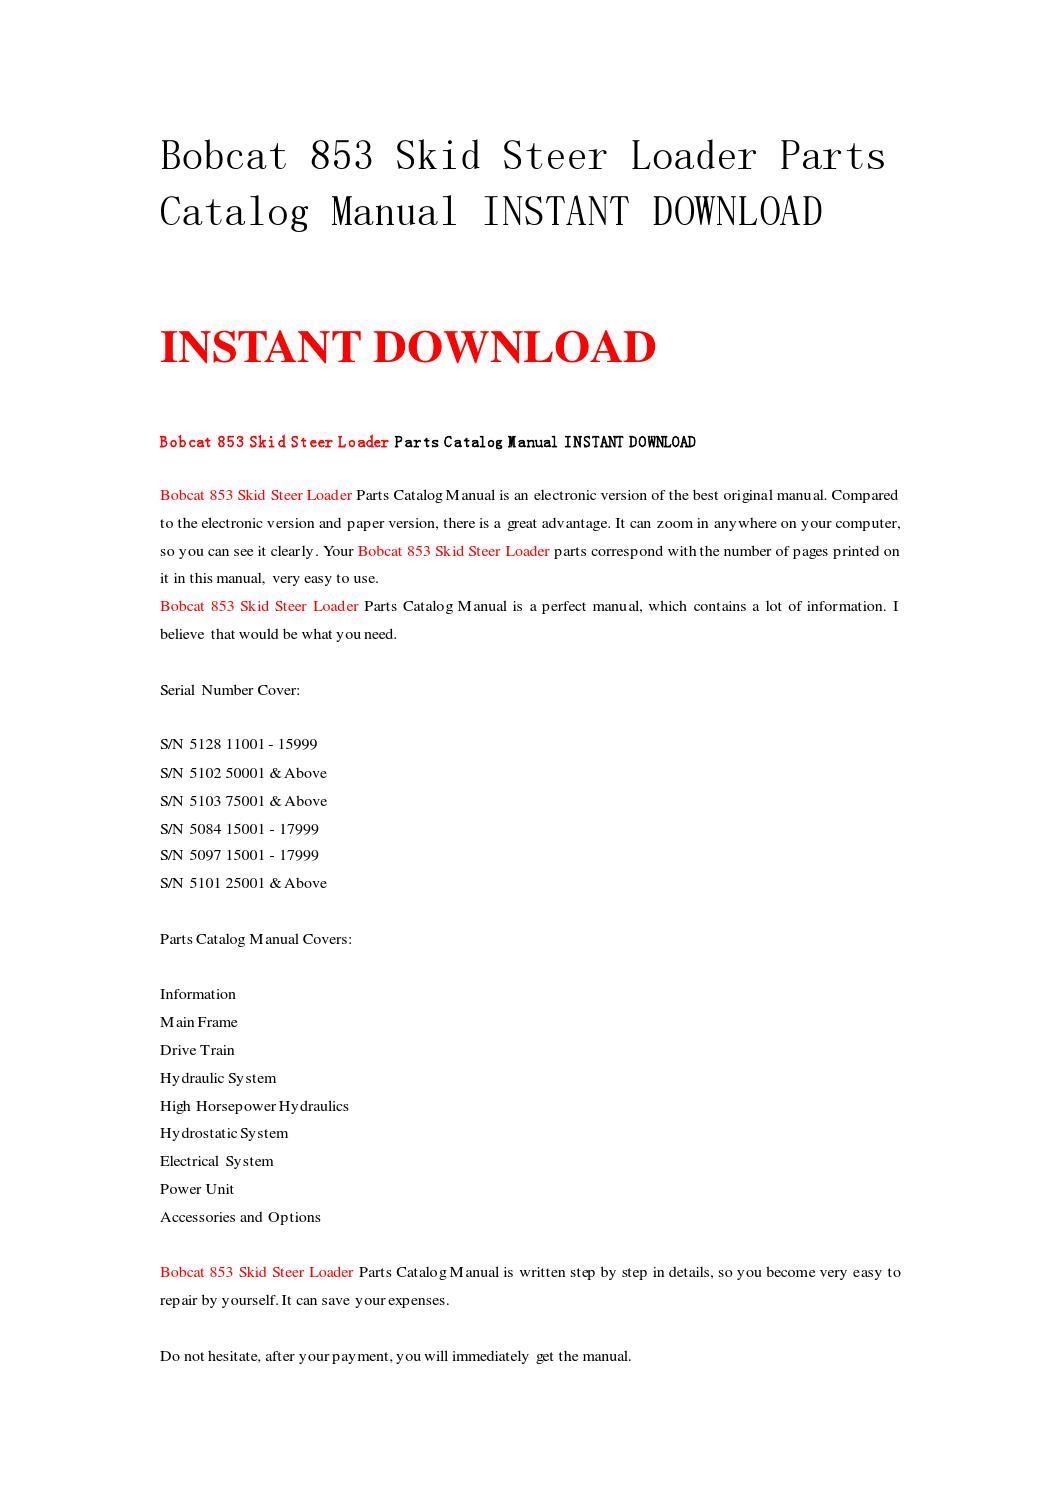 bobcat 853 skid steer loader parts catalog manual instant download workshop  by k2repairmanual - issuu